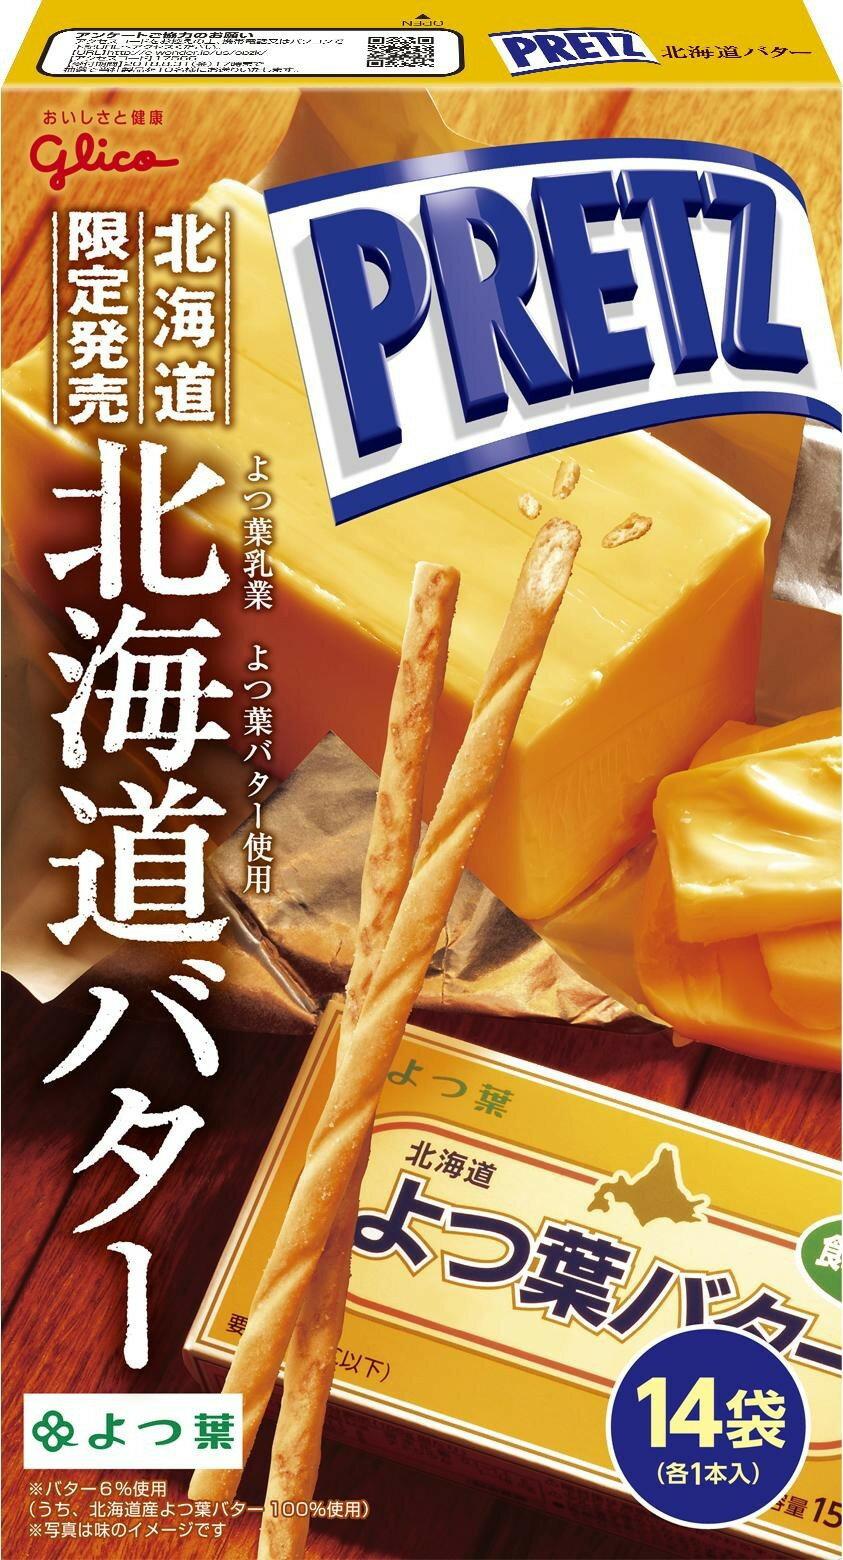 【Glico固力果】PRETZ巨人餅乾棒-北海道奶油口味 14袋X1本入(91g) =新鮮到貨= 3.18-4 / 7店休 暫停出貨 2